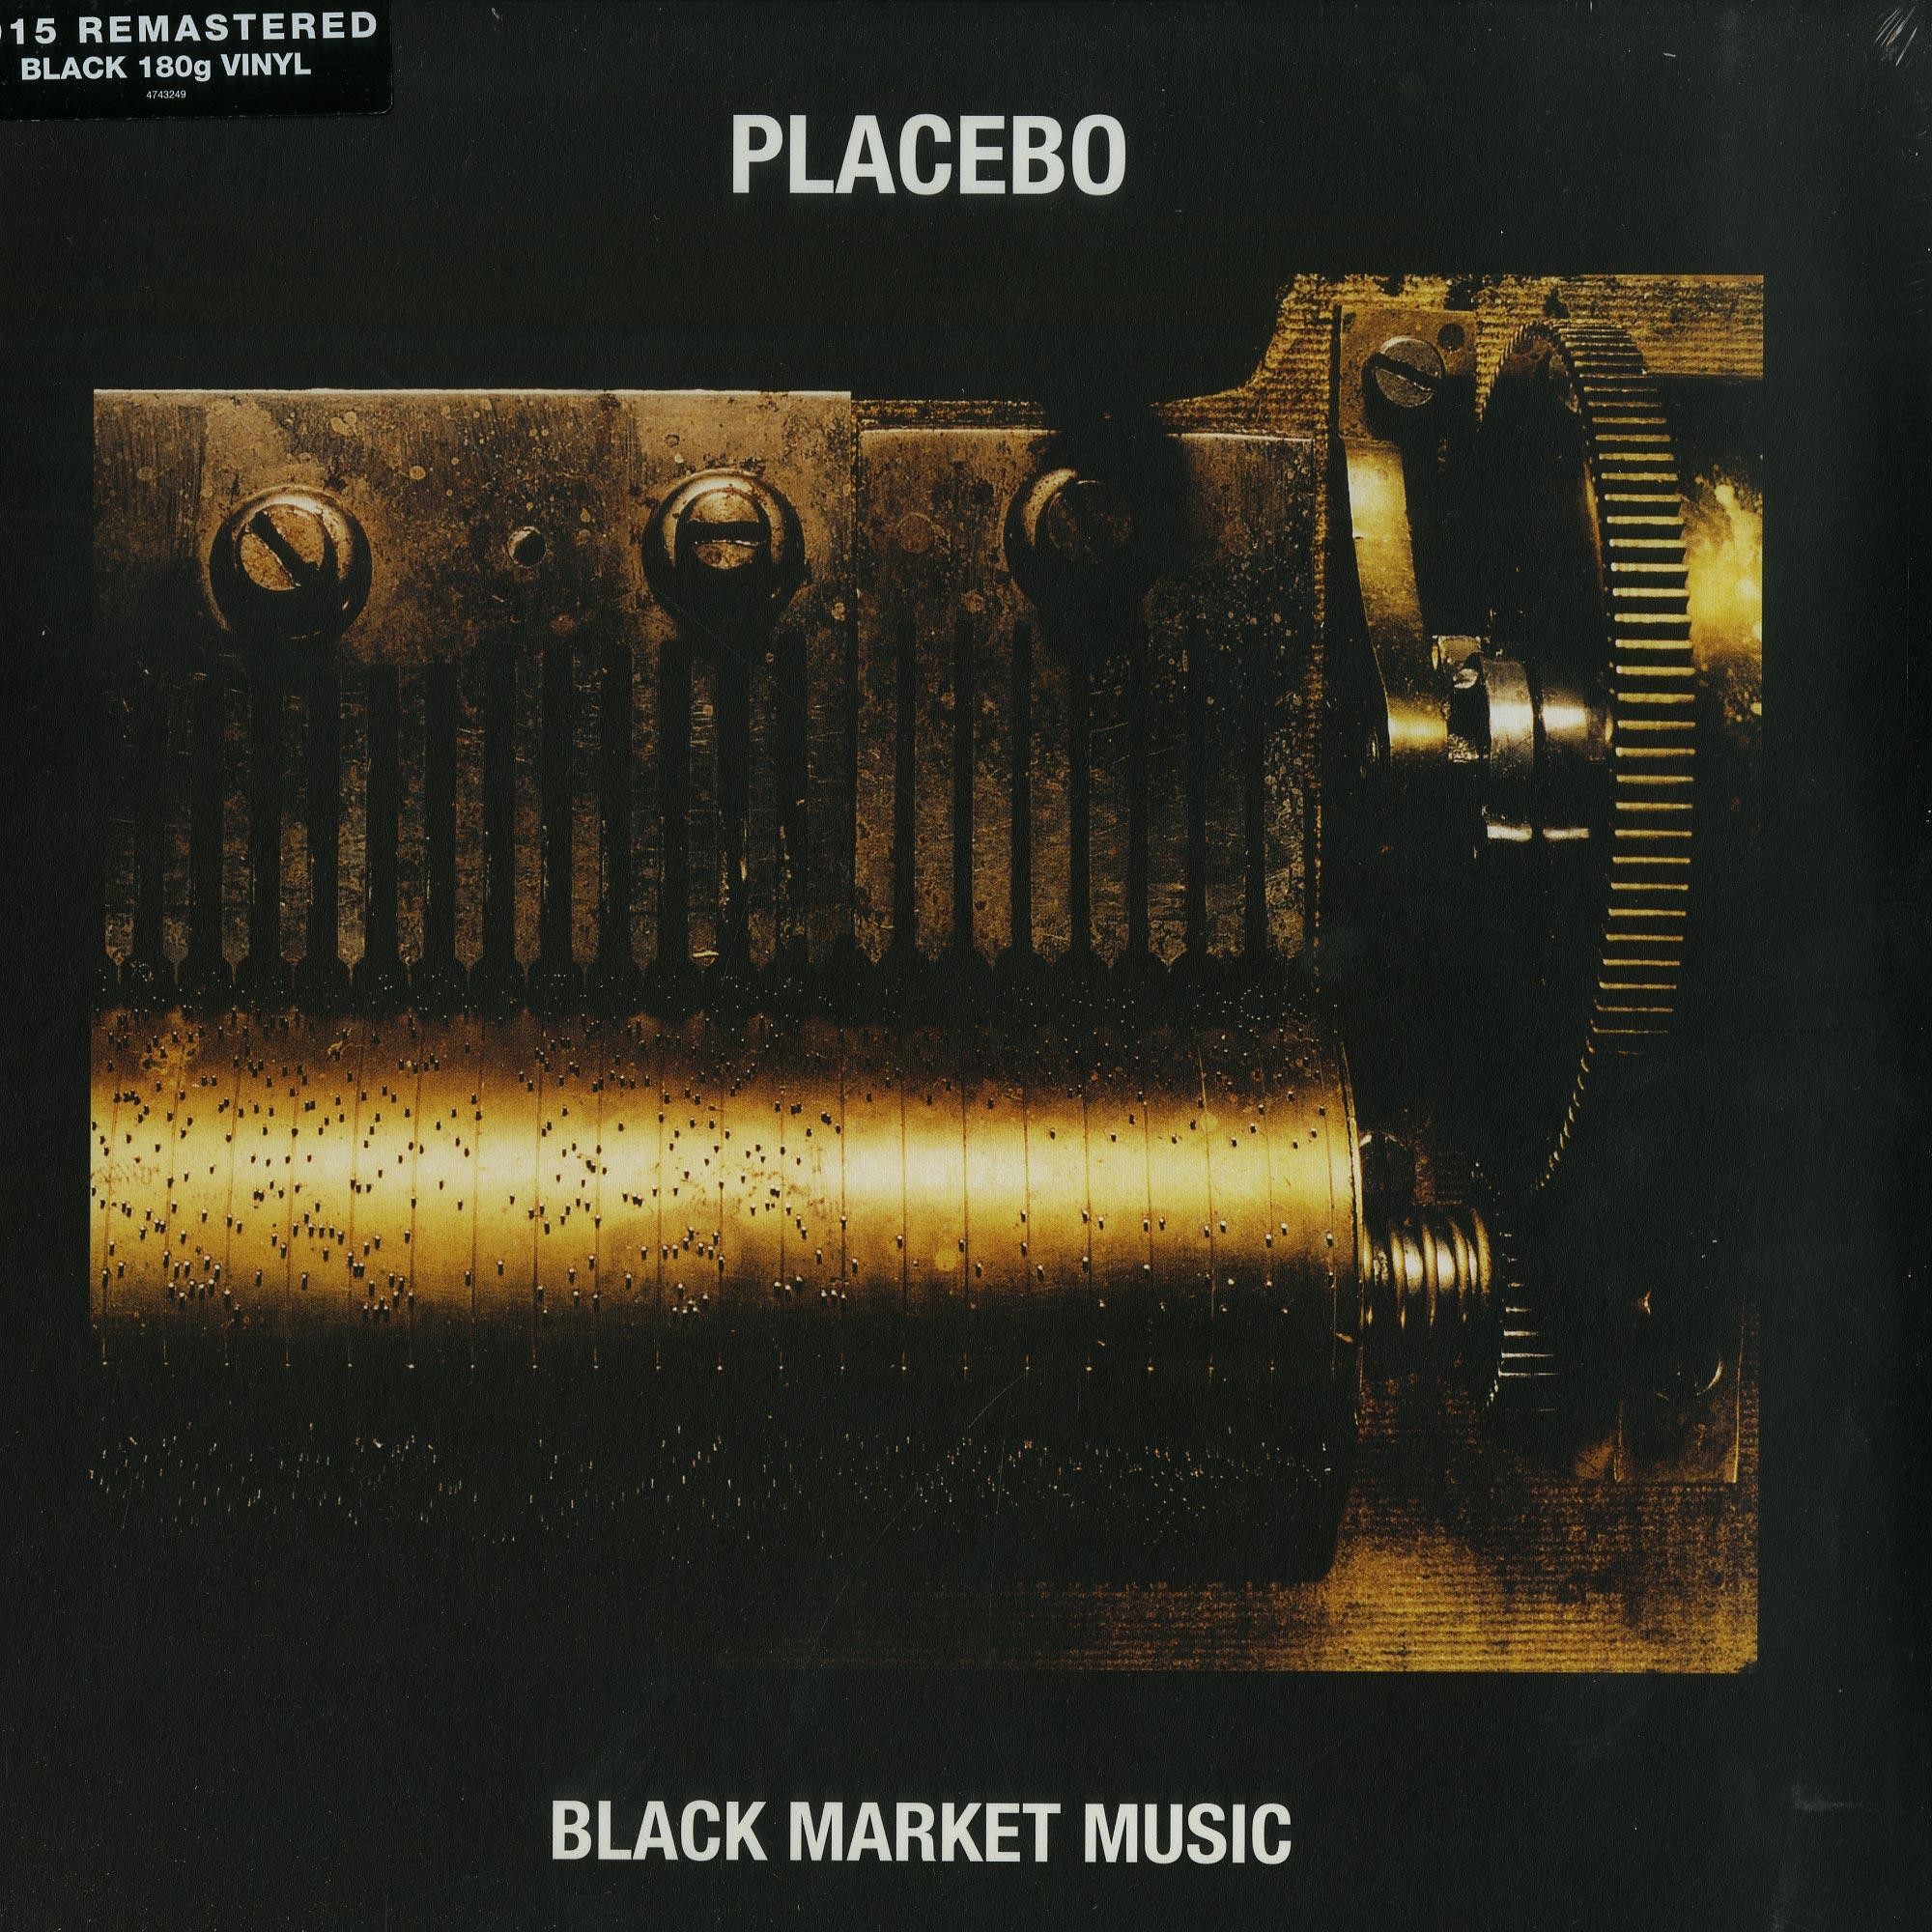 Placebo - BLACK MARKET MUSIC